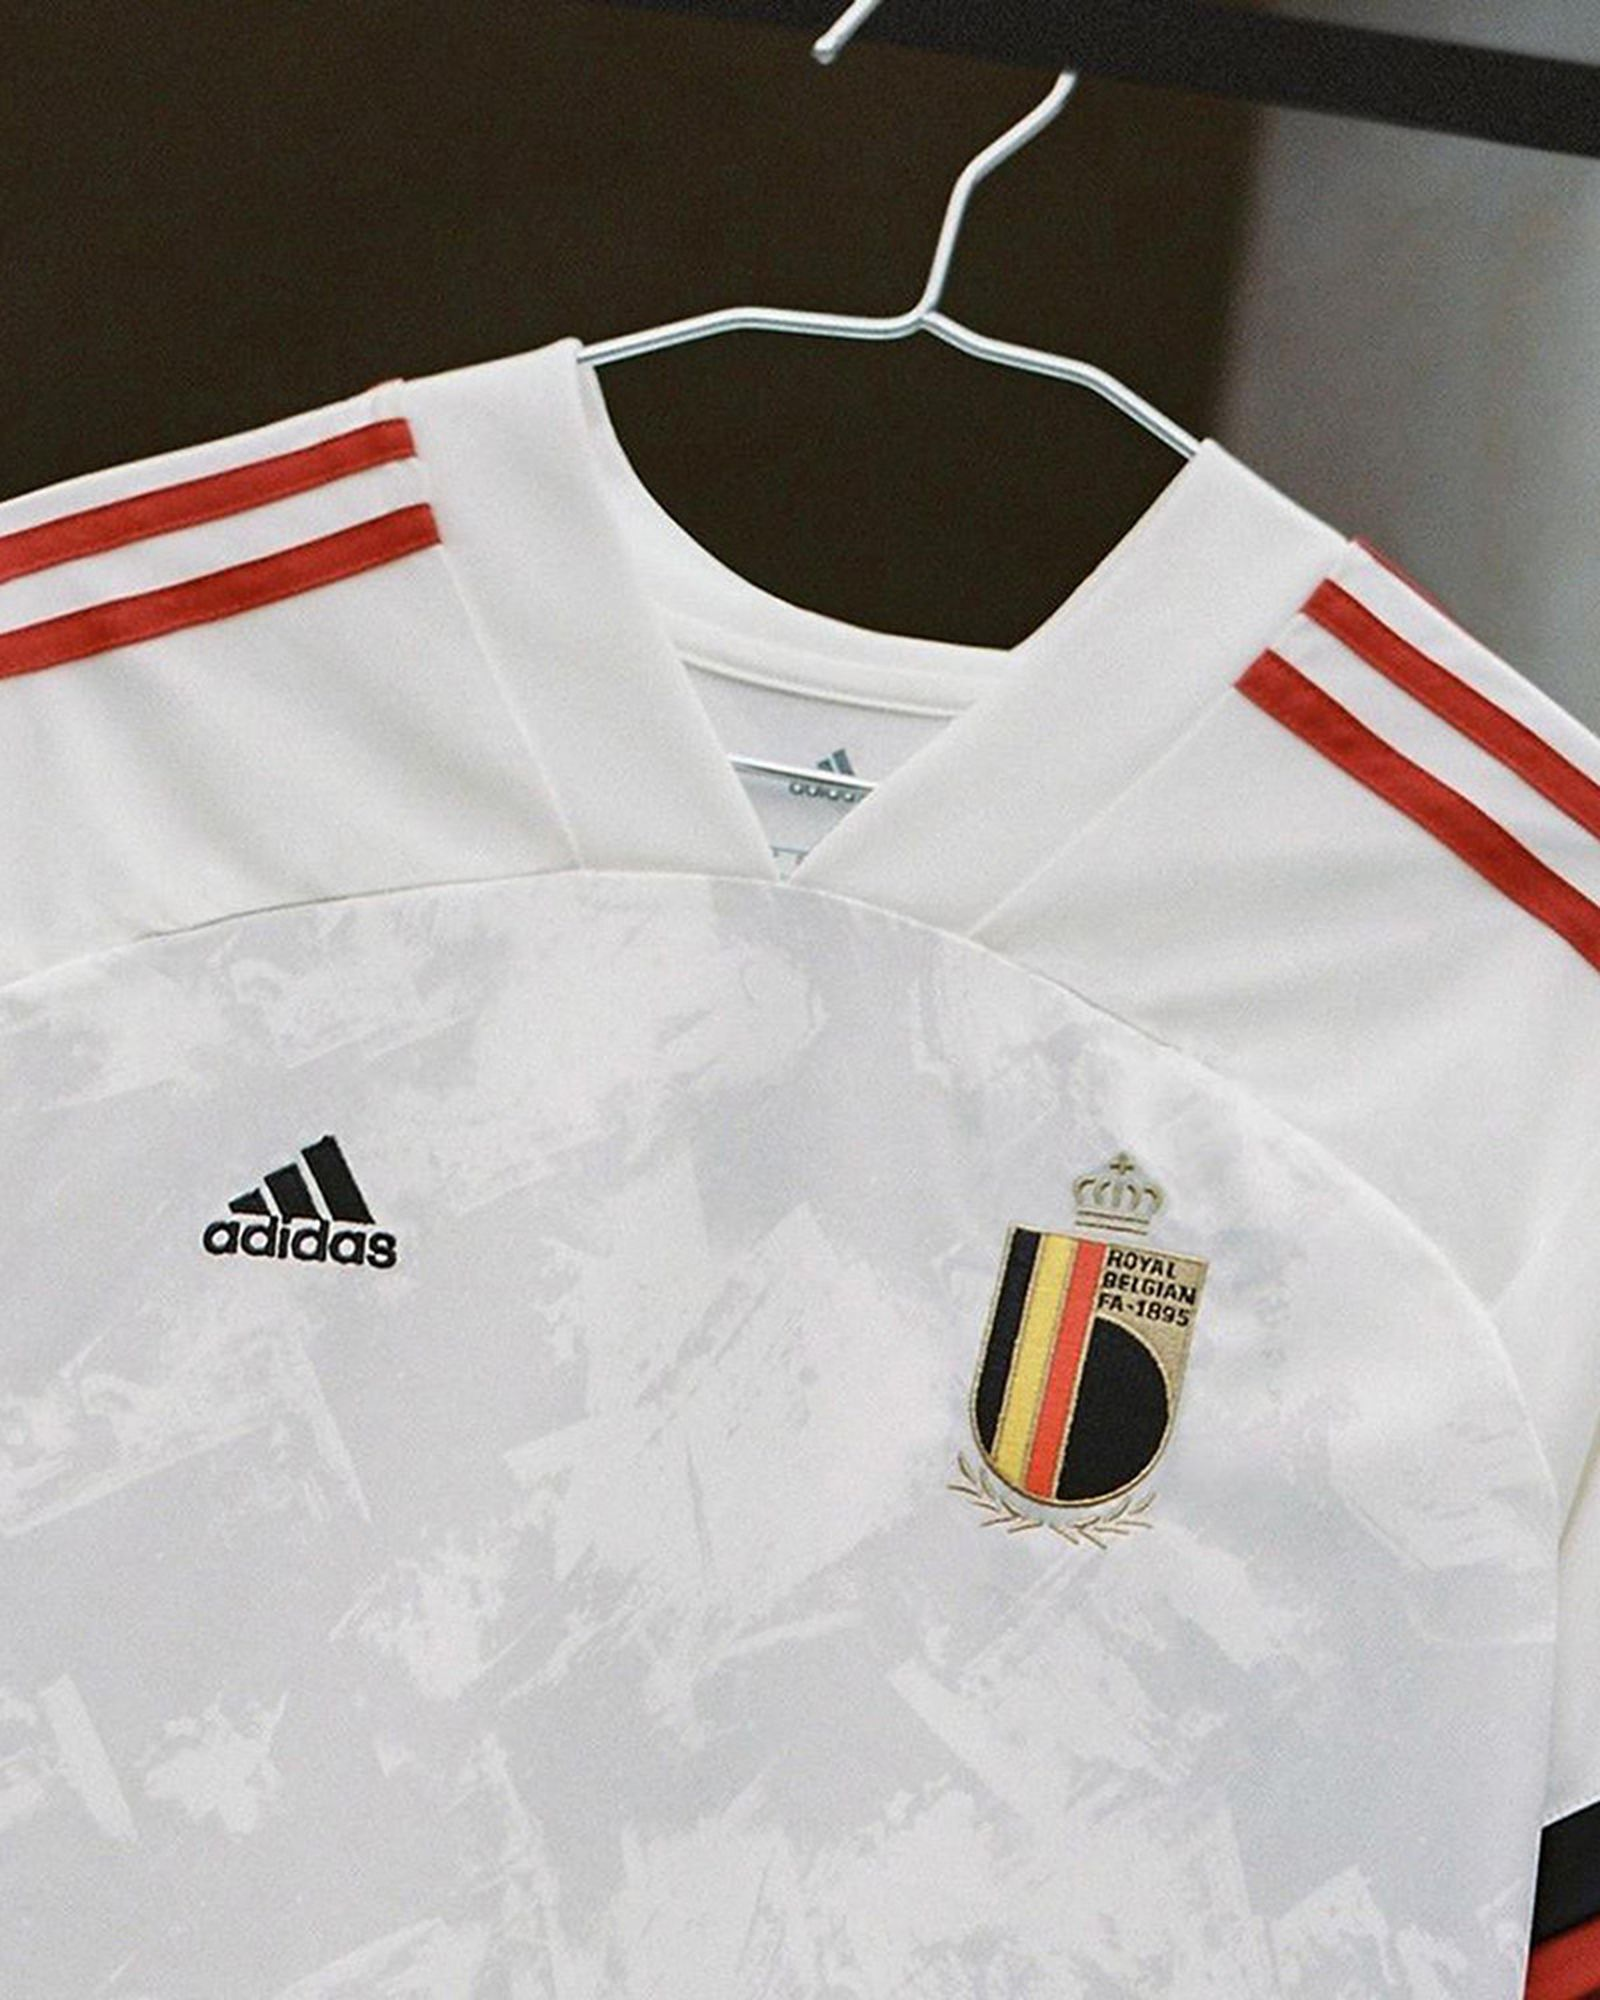 euro-2020-jersey-roundtable-ranking-belgium-02